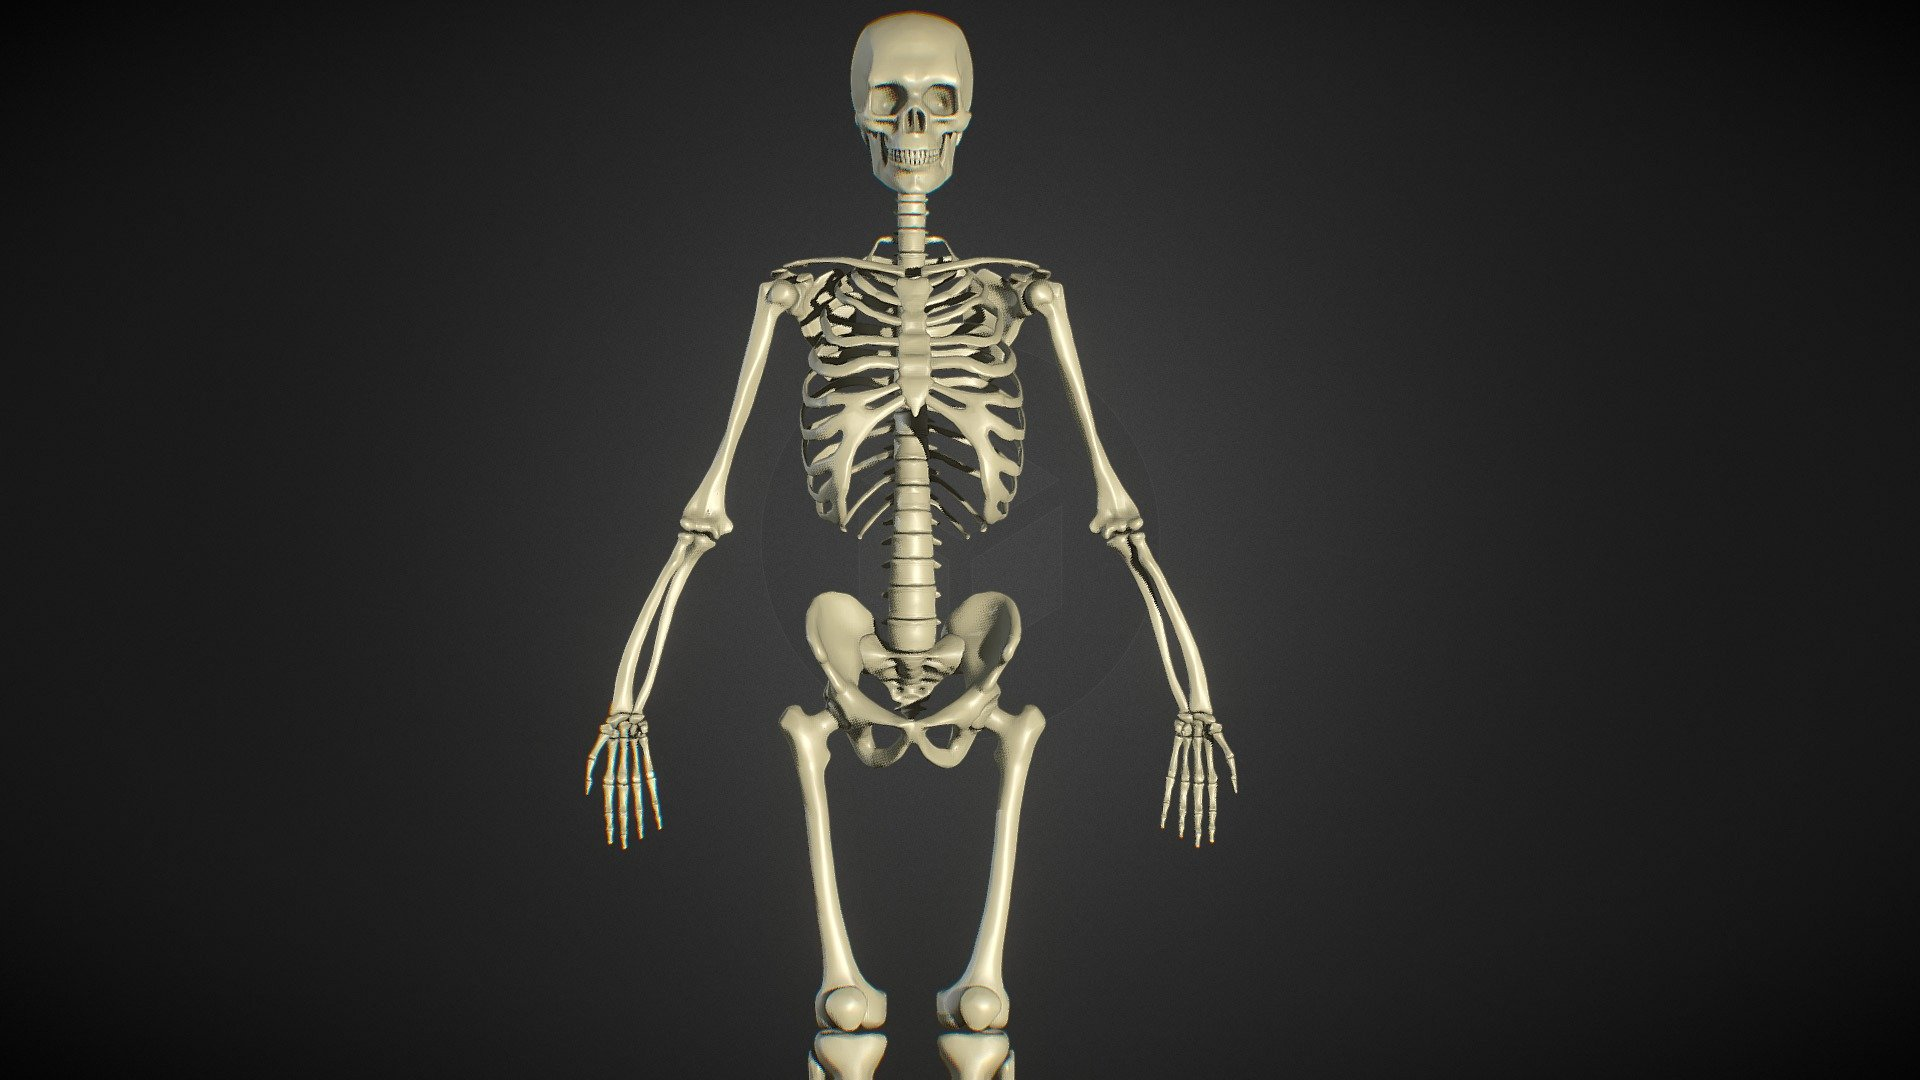 diagram of male skeleton male human skeleton zbrush anatomy study 3d model by ruslan  human skeleton zbrush anatomy study